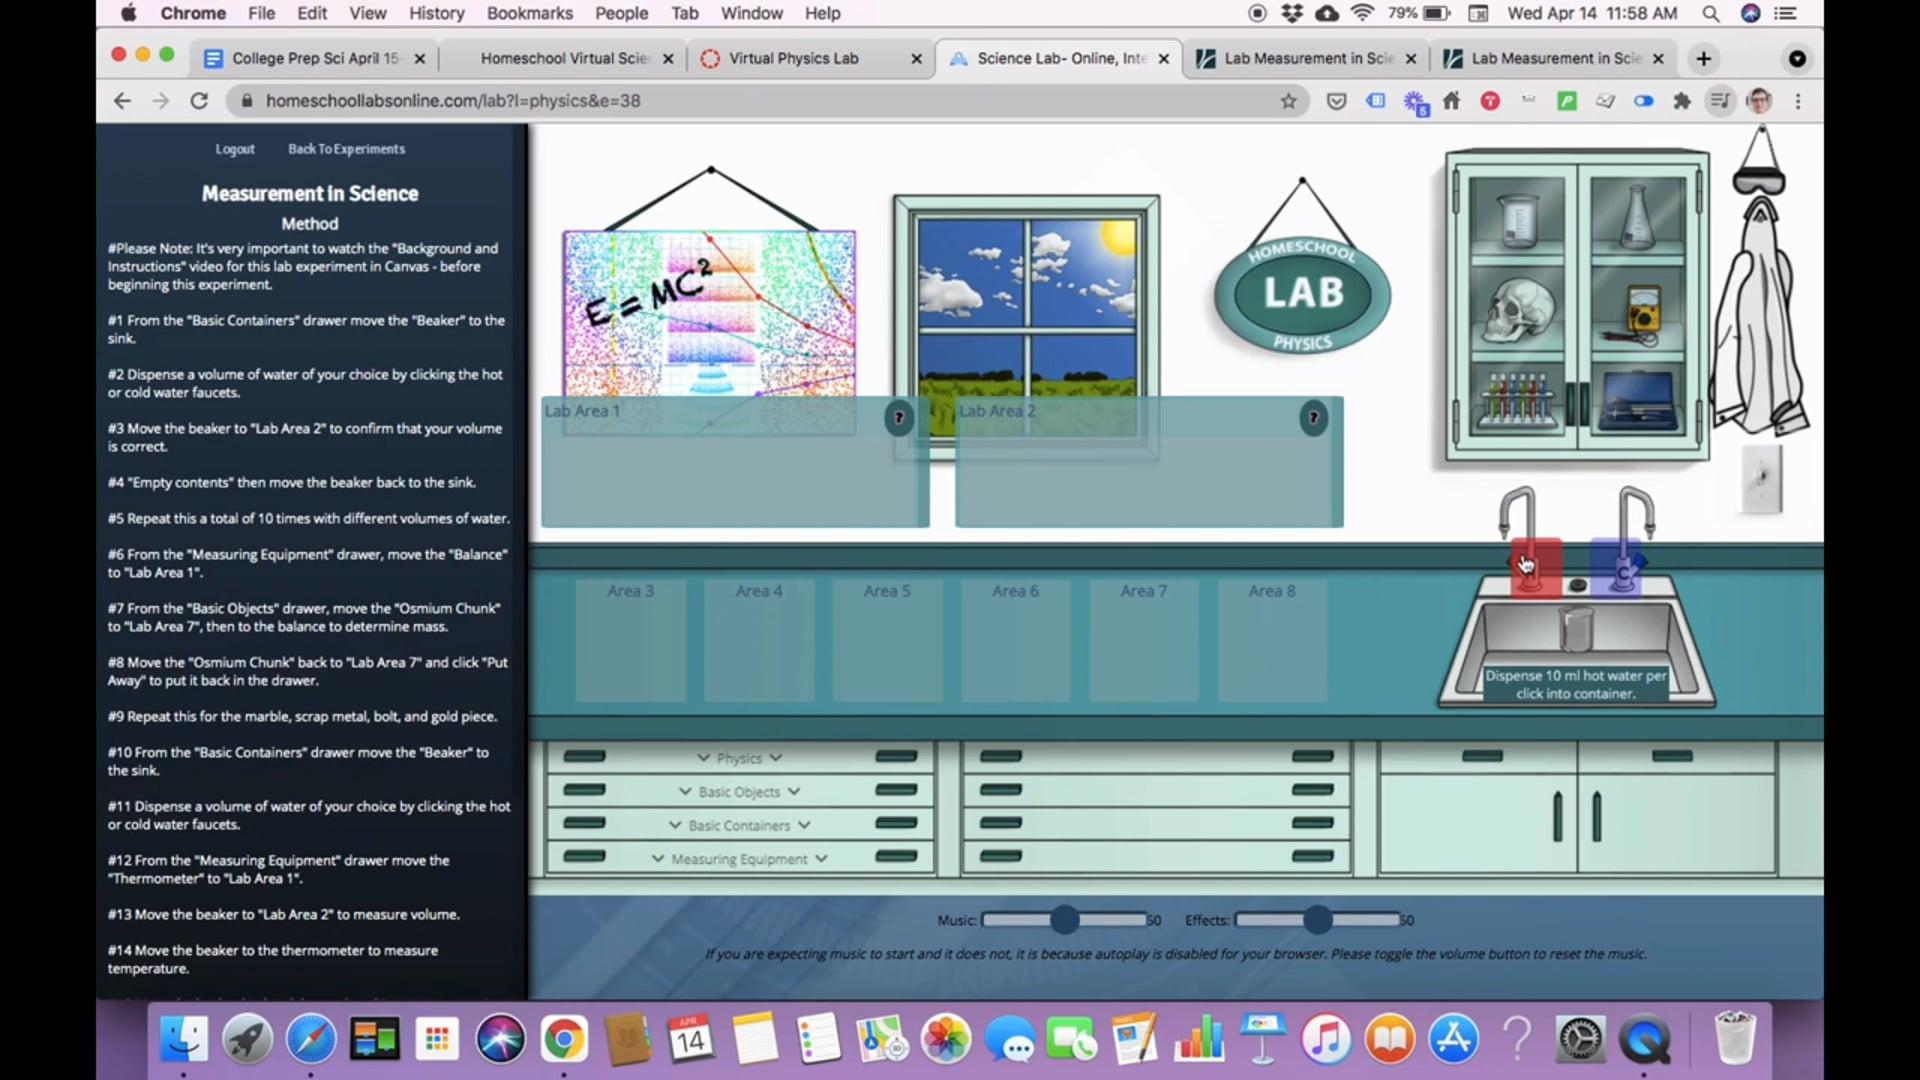 Greg Landry - College Prep Science Virtual Homeschool Lab Video Review